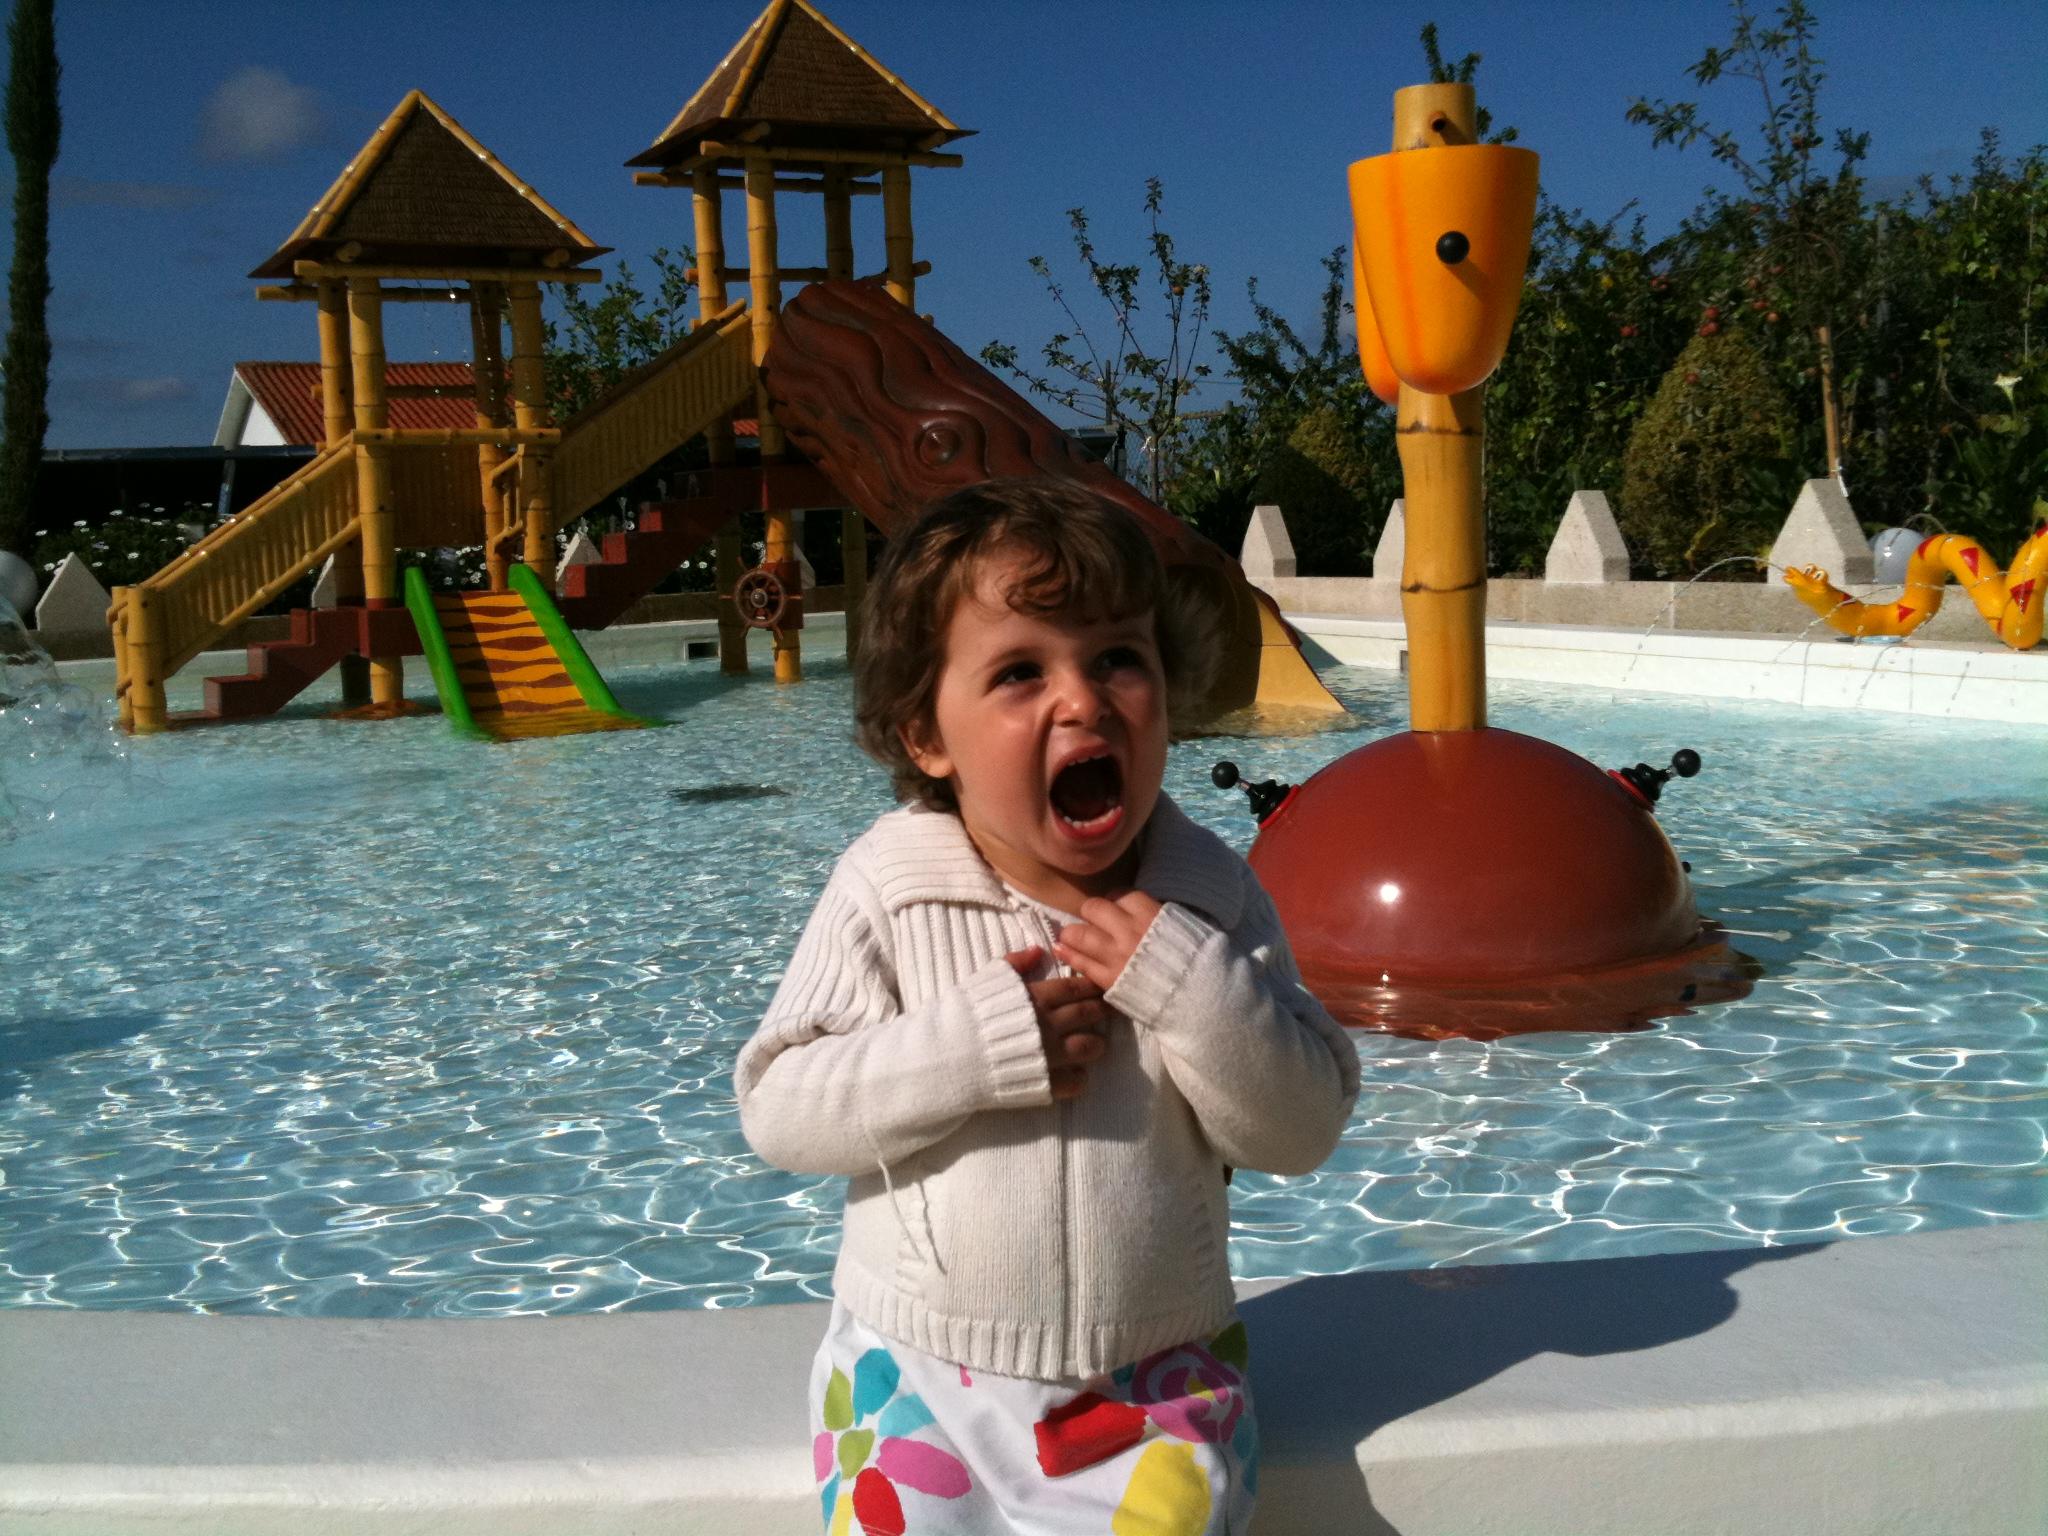 Hoteles en galicia mam s peques y s per planes for Hoteles familiares con piscina